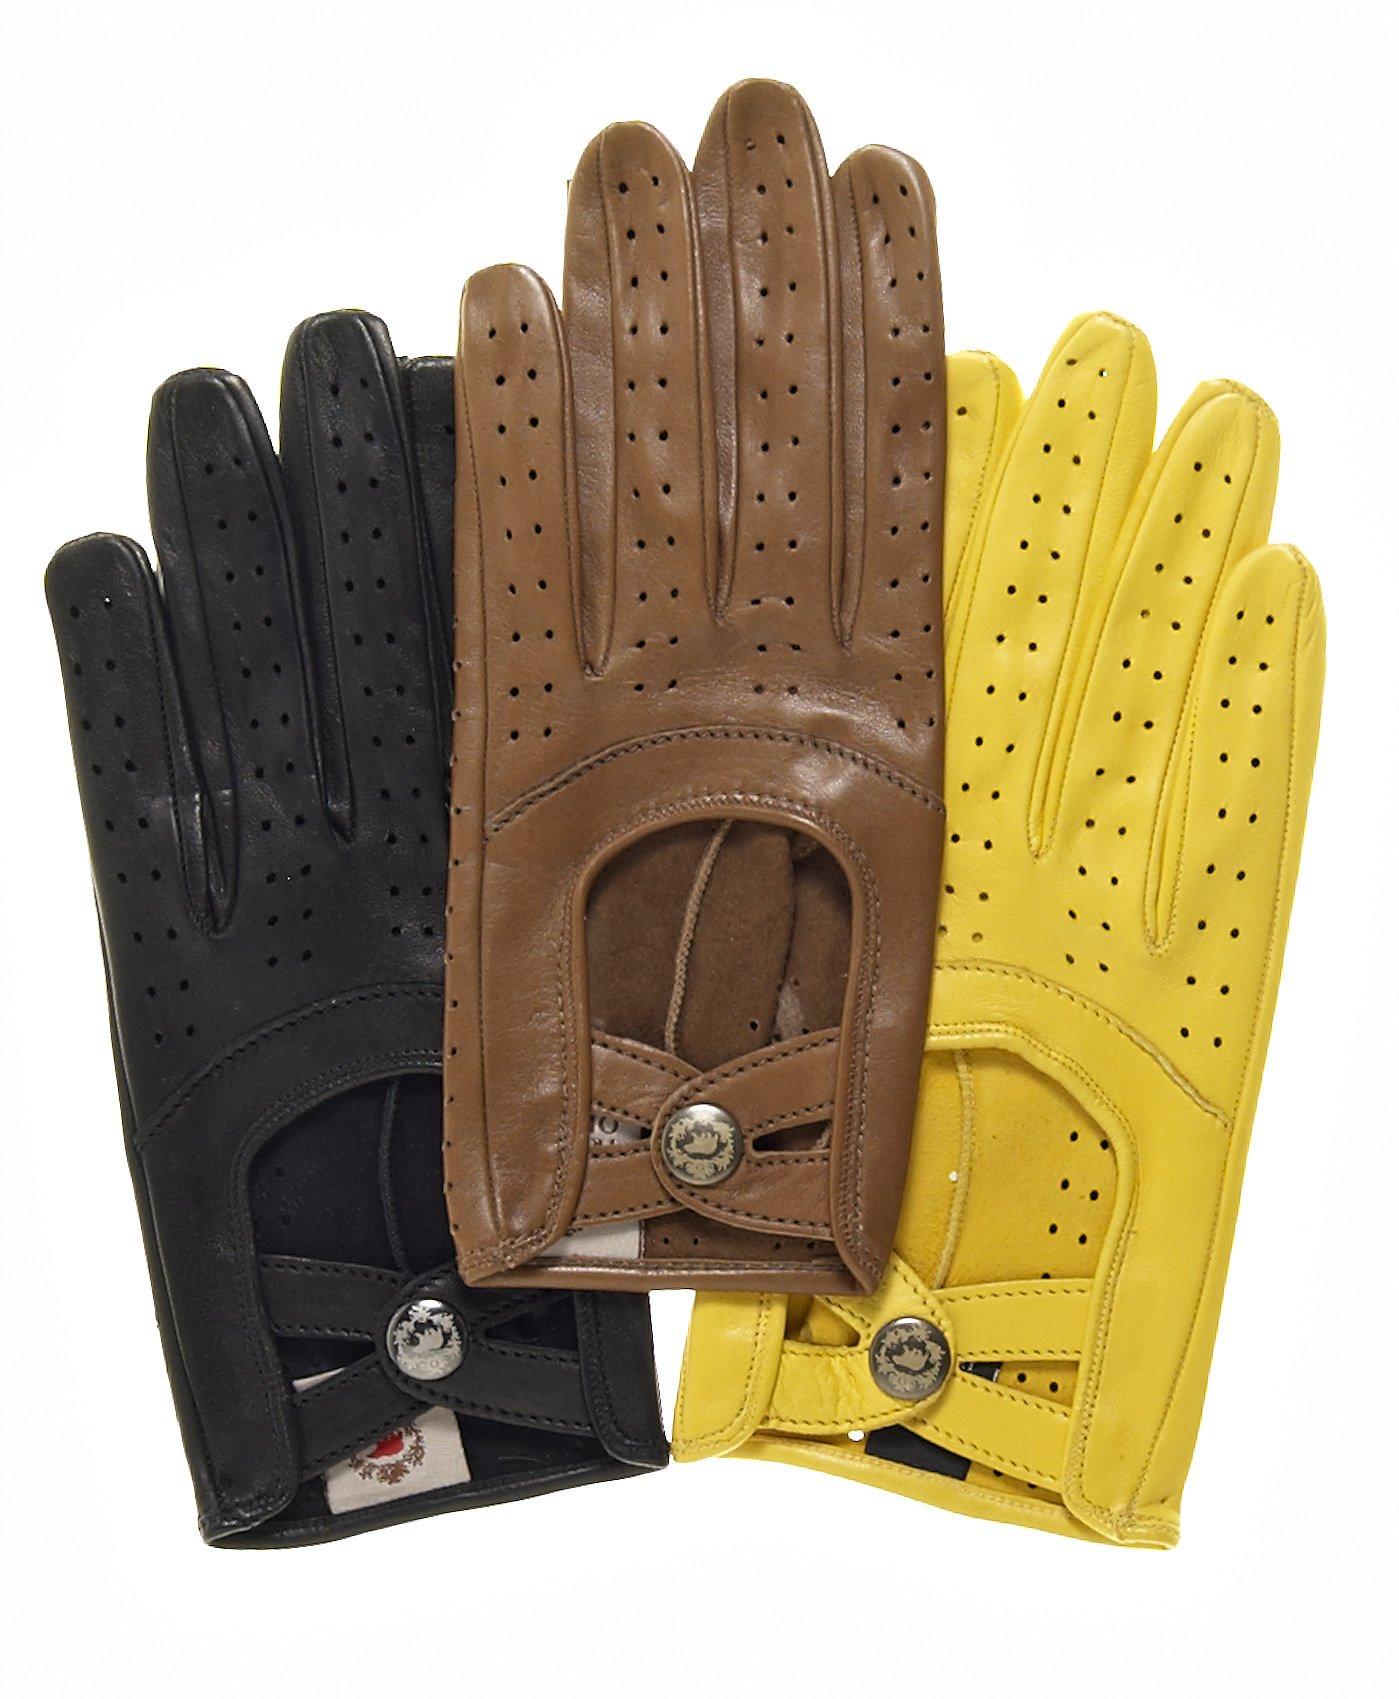 Fratelli Orsini Women's Sporty Italian Leather Driving Gloves Size 7 Color Black